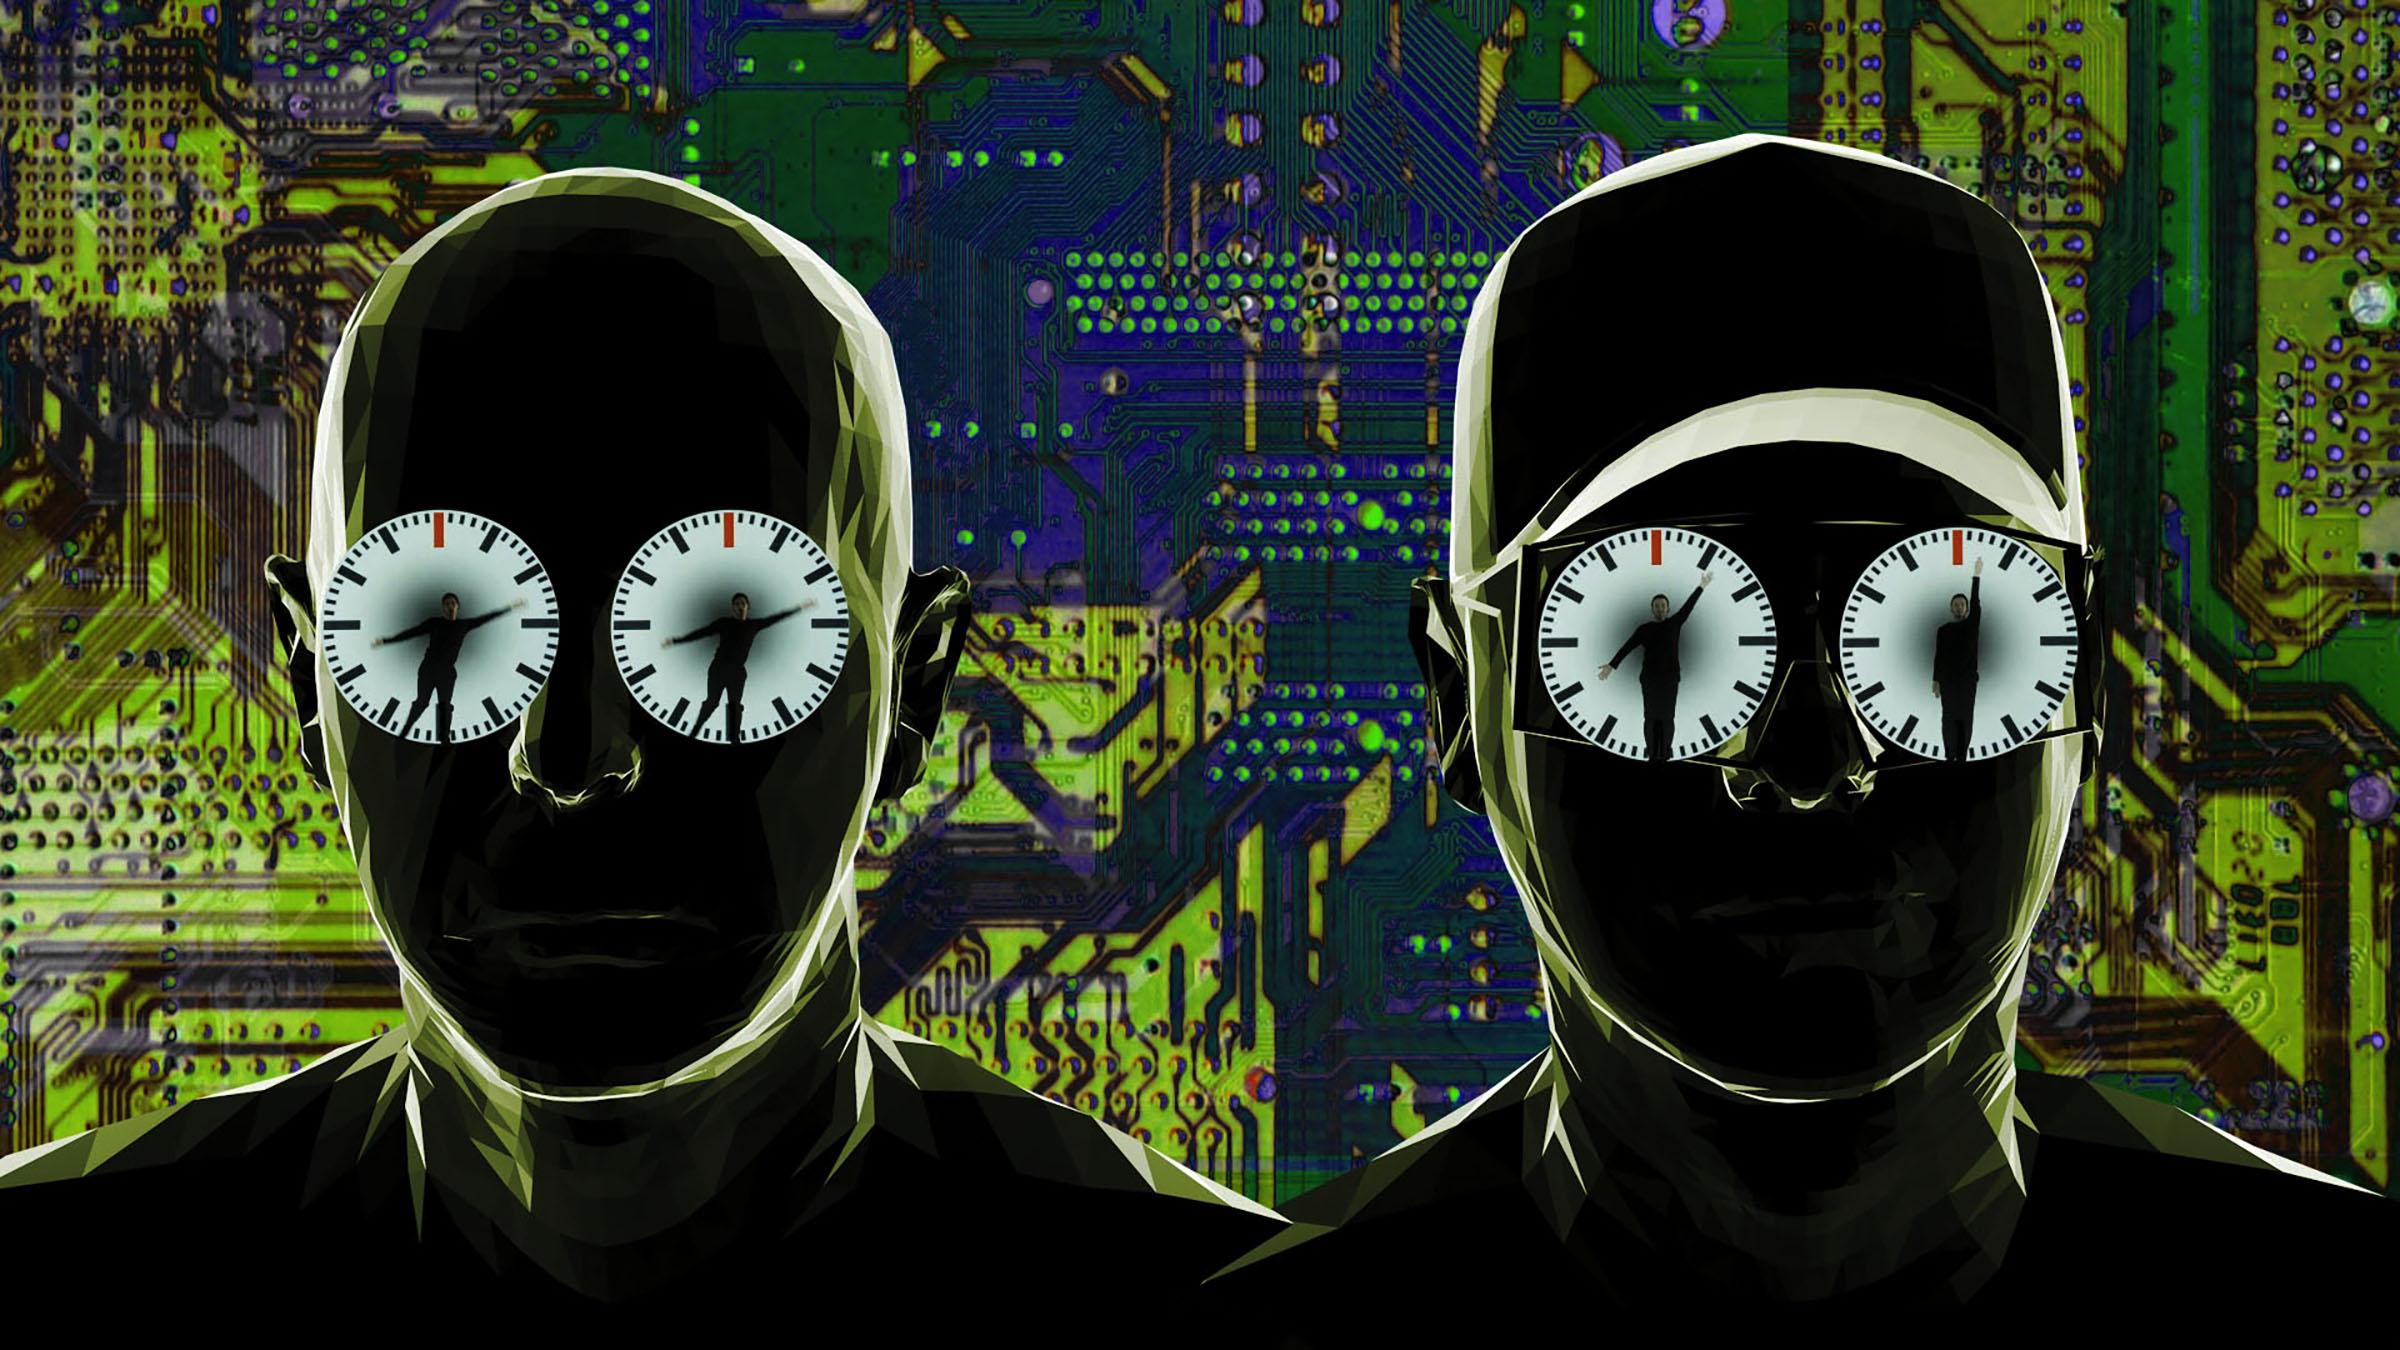 Luke Halls Studio — Pet Shop Boys – Electric World Tour